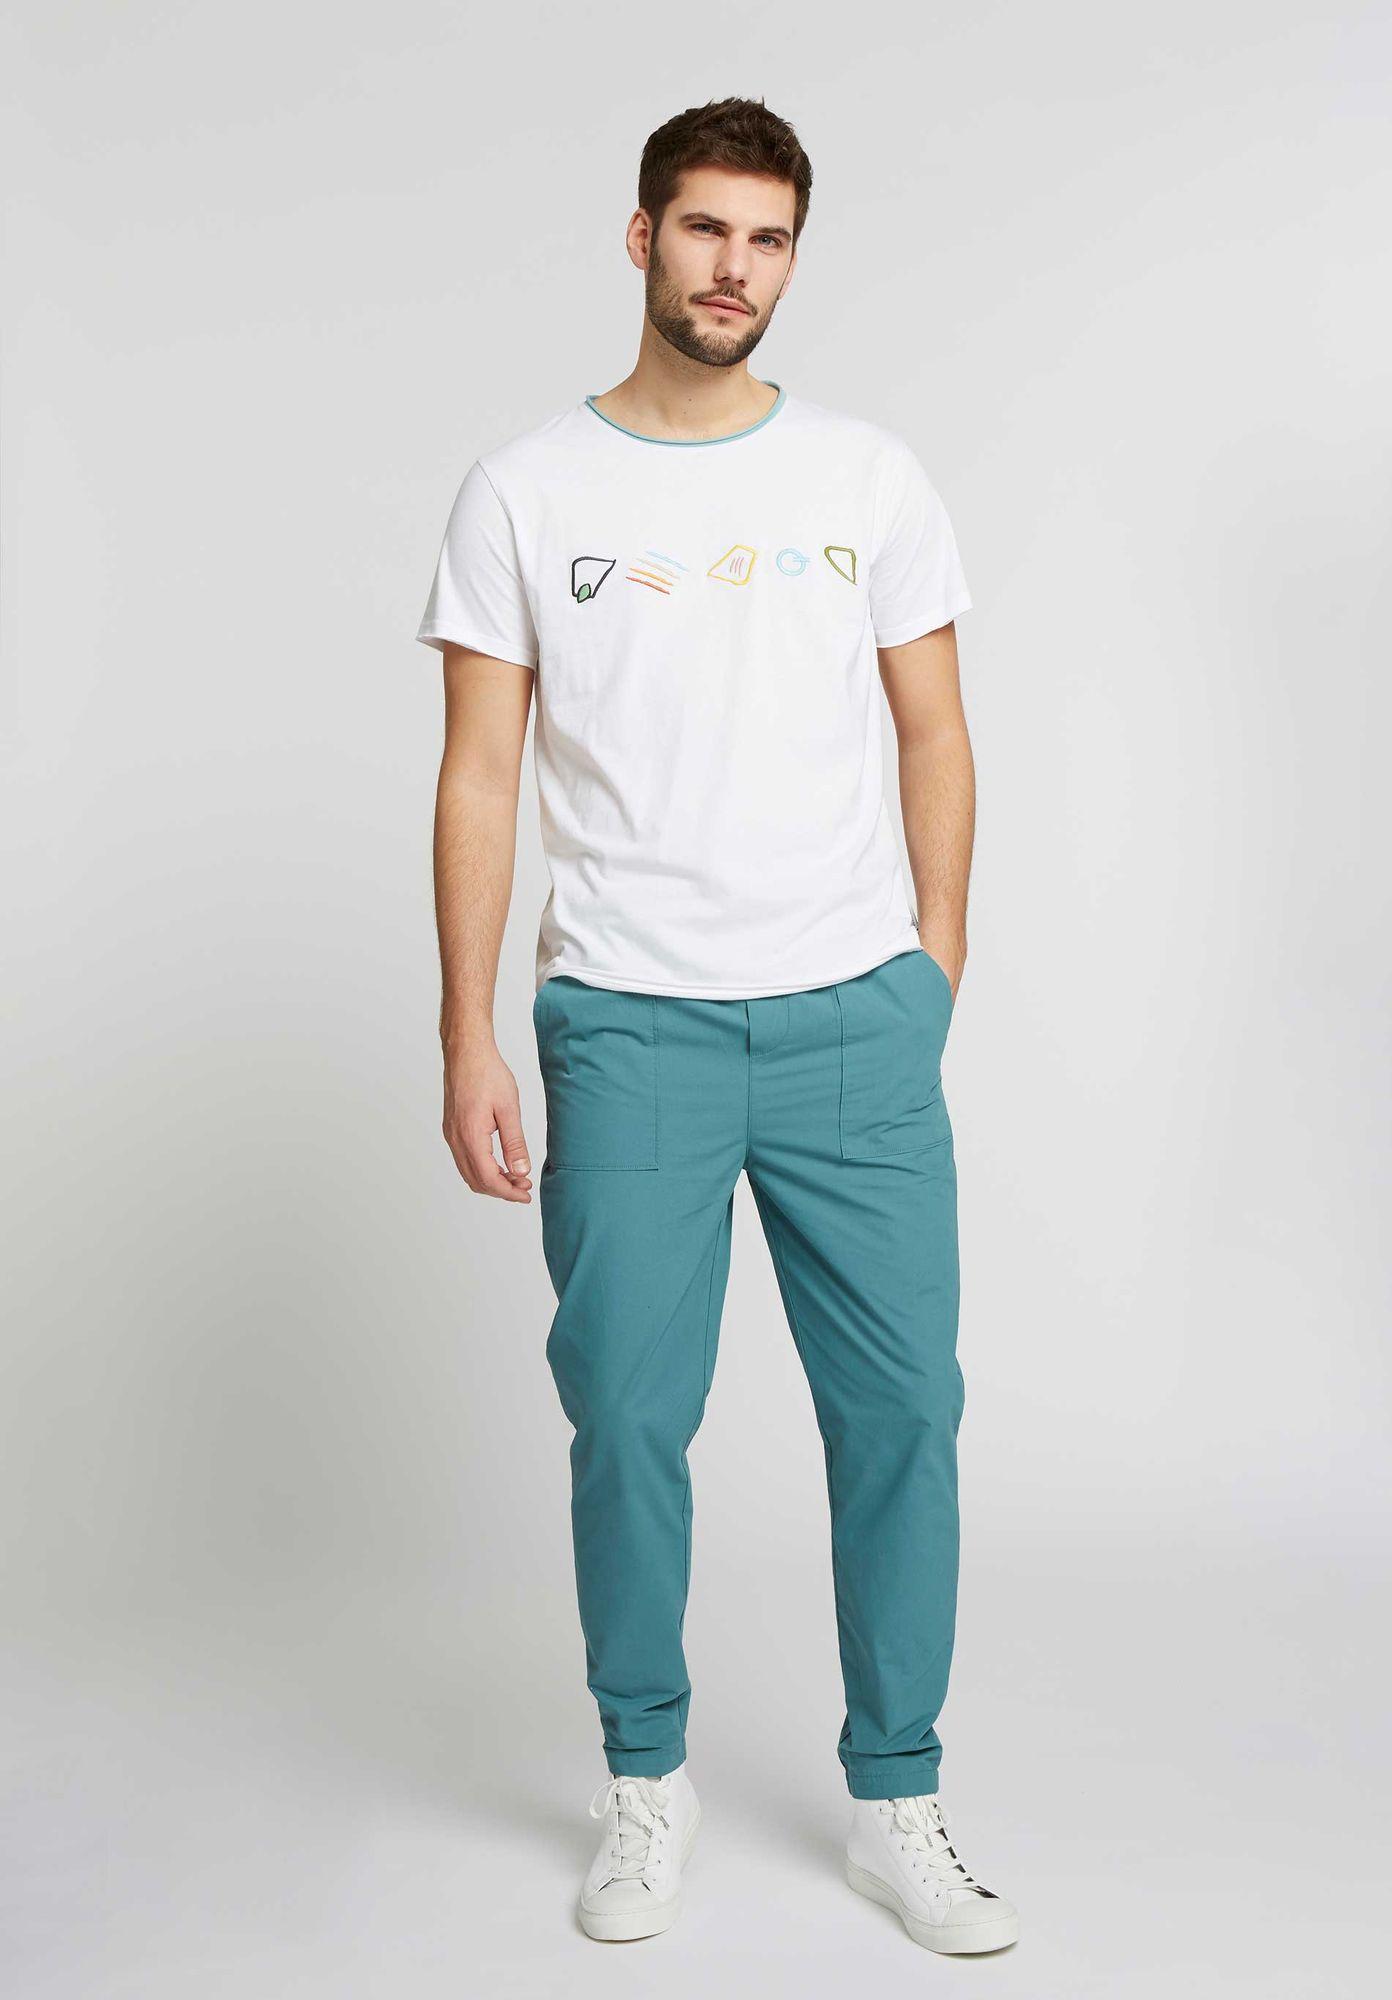 TT82 Woven Pants